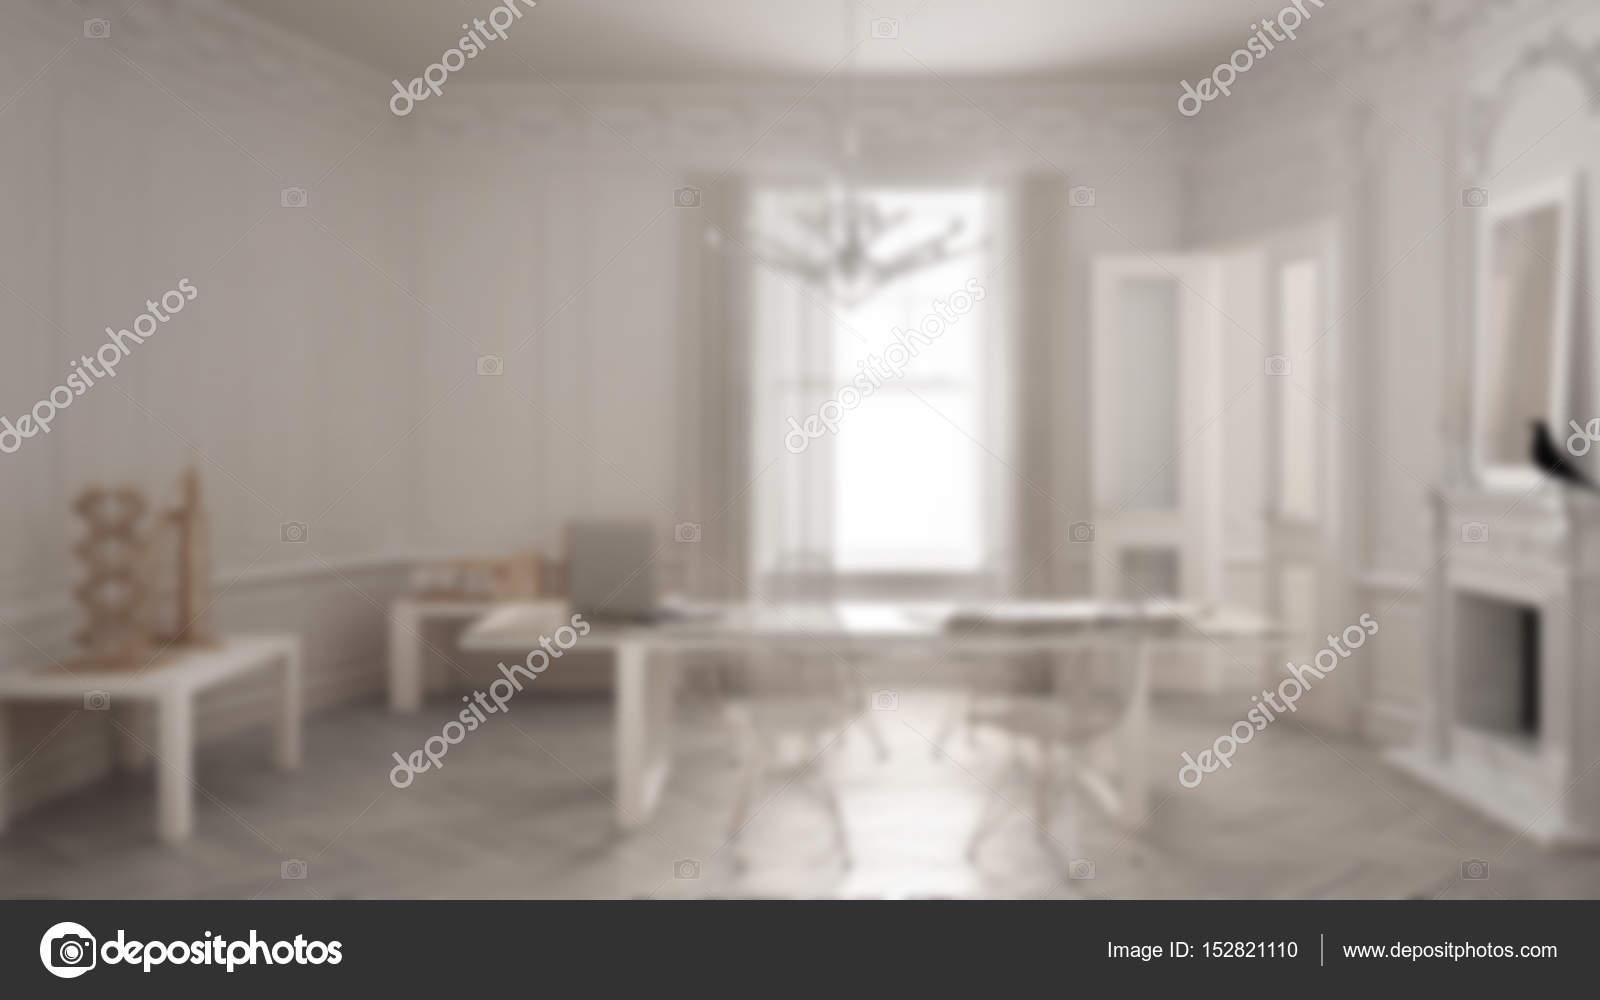 Design Ufficio Moderno : Sfocatura sfondo interior design ufficio moderno minimalista in